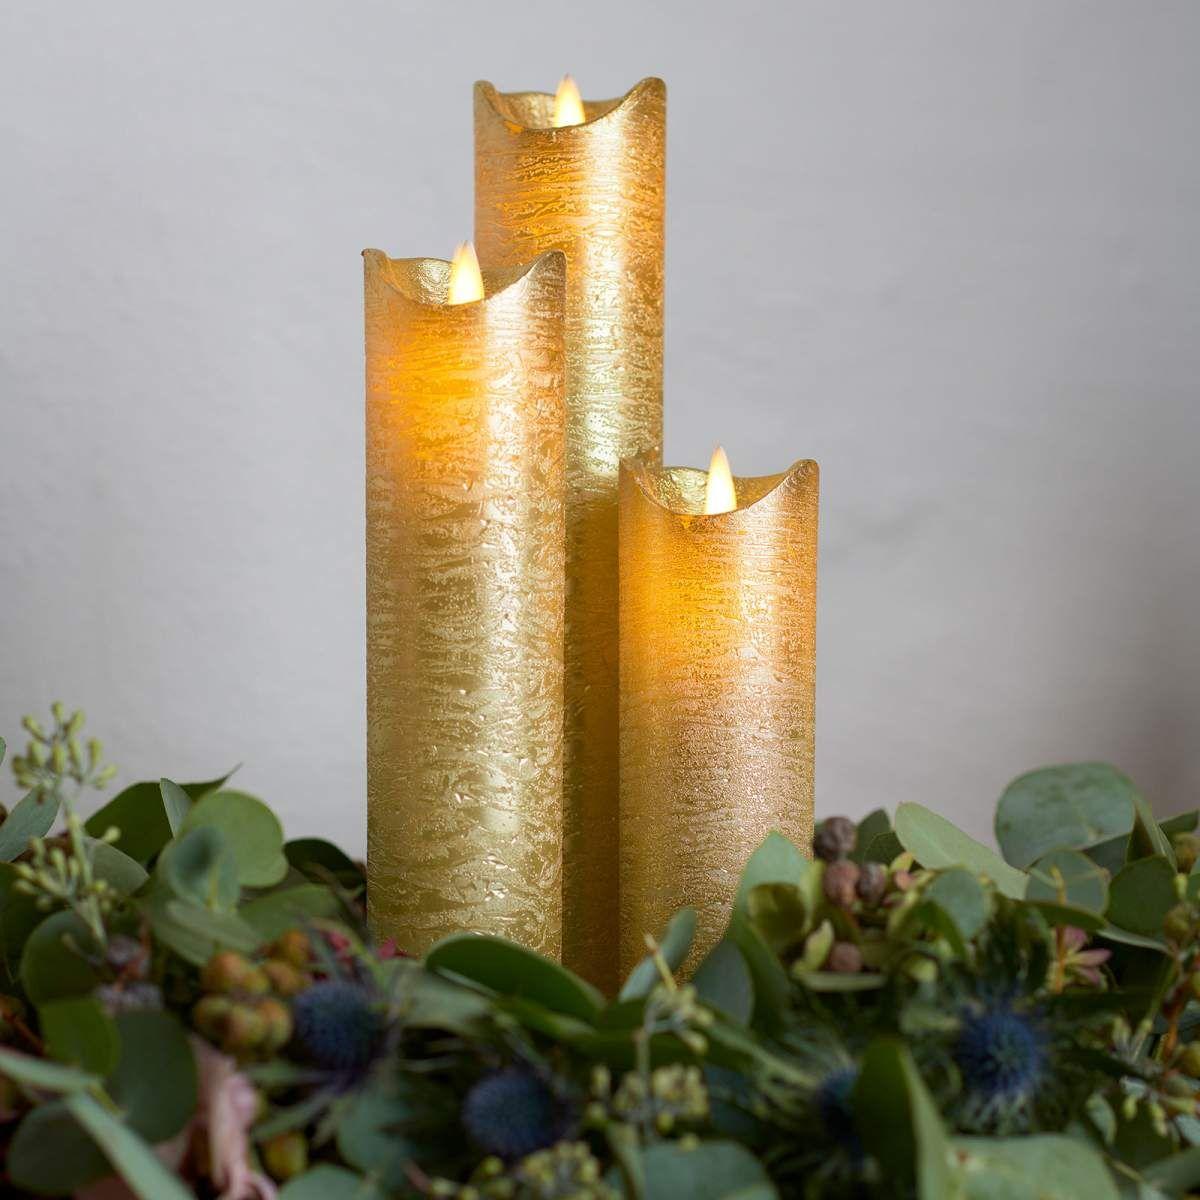 Led Kerze Sara Exclusive Von Sirius Gold Led Kerzen Kerzen Und